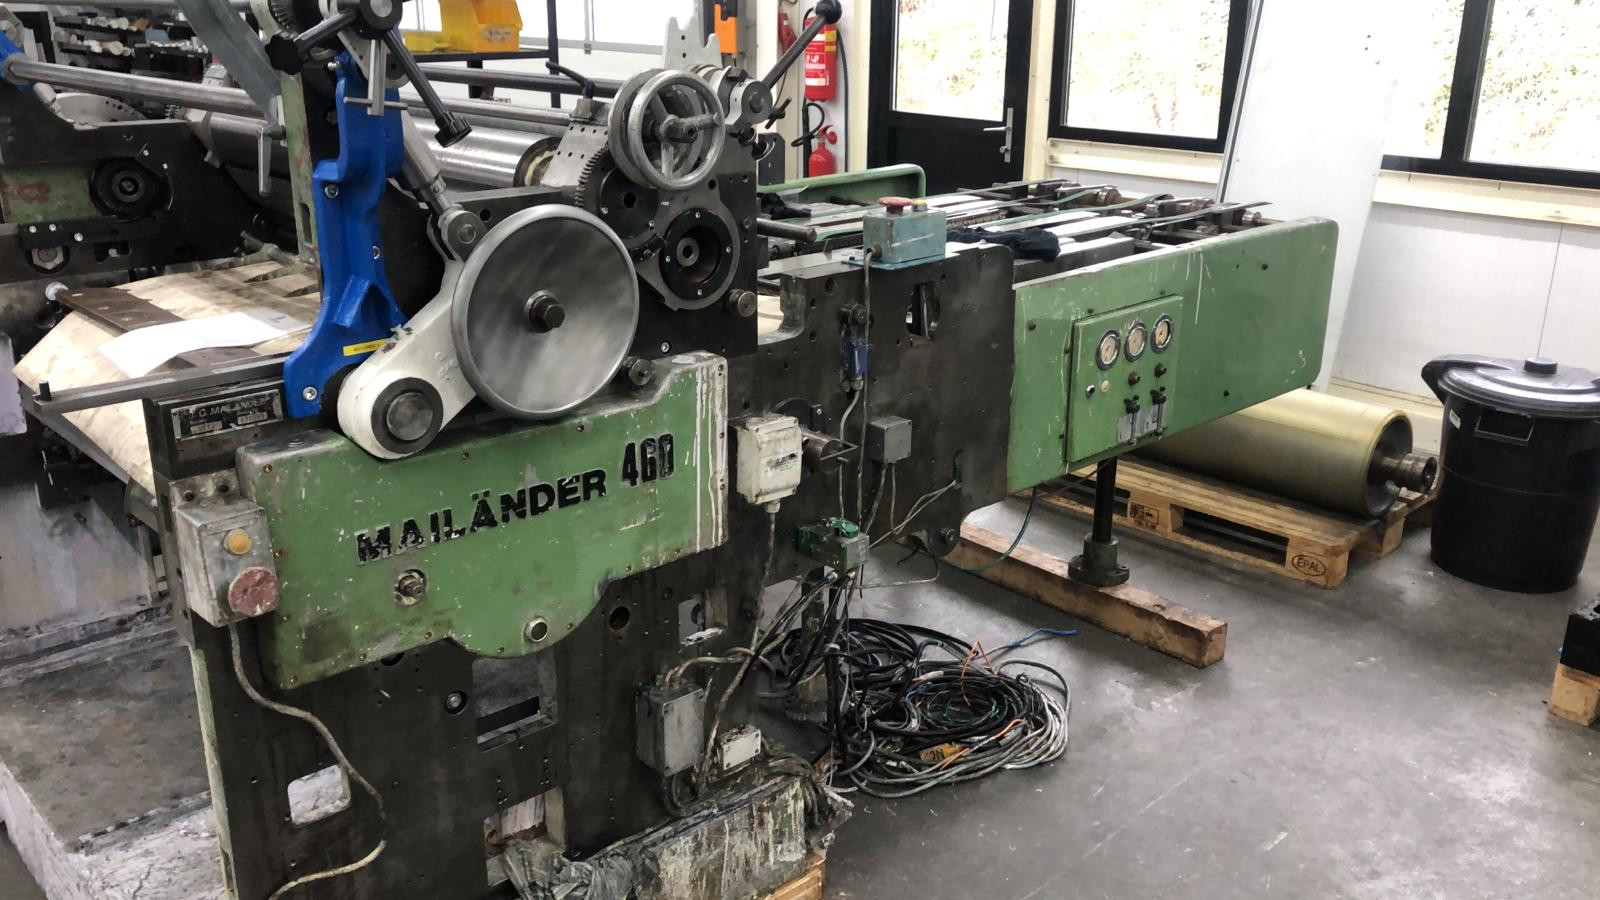 Mailander 460 varnish coating machine